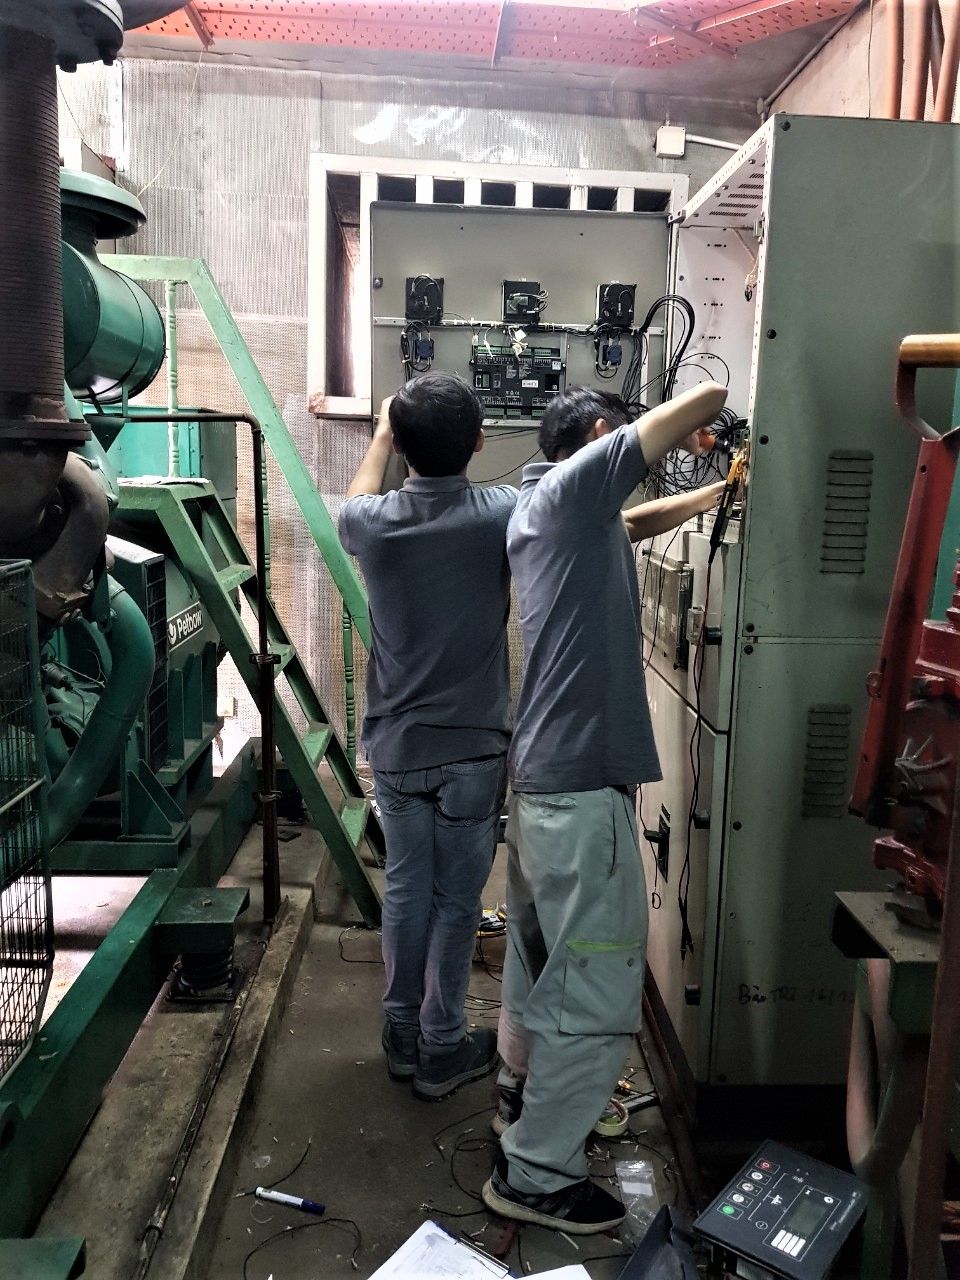 Service maintenance for air compressor, generator system